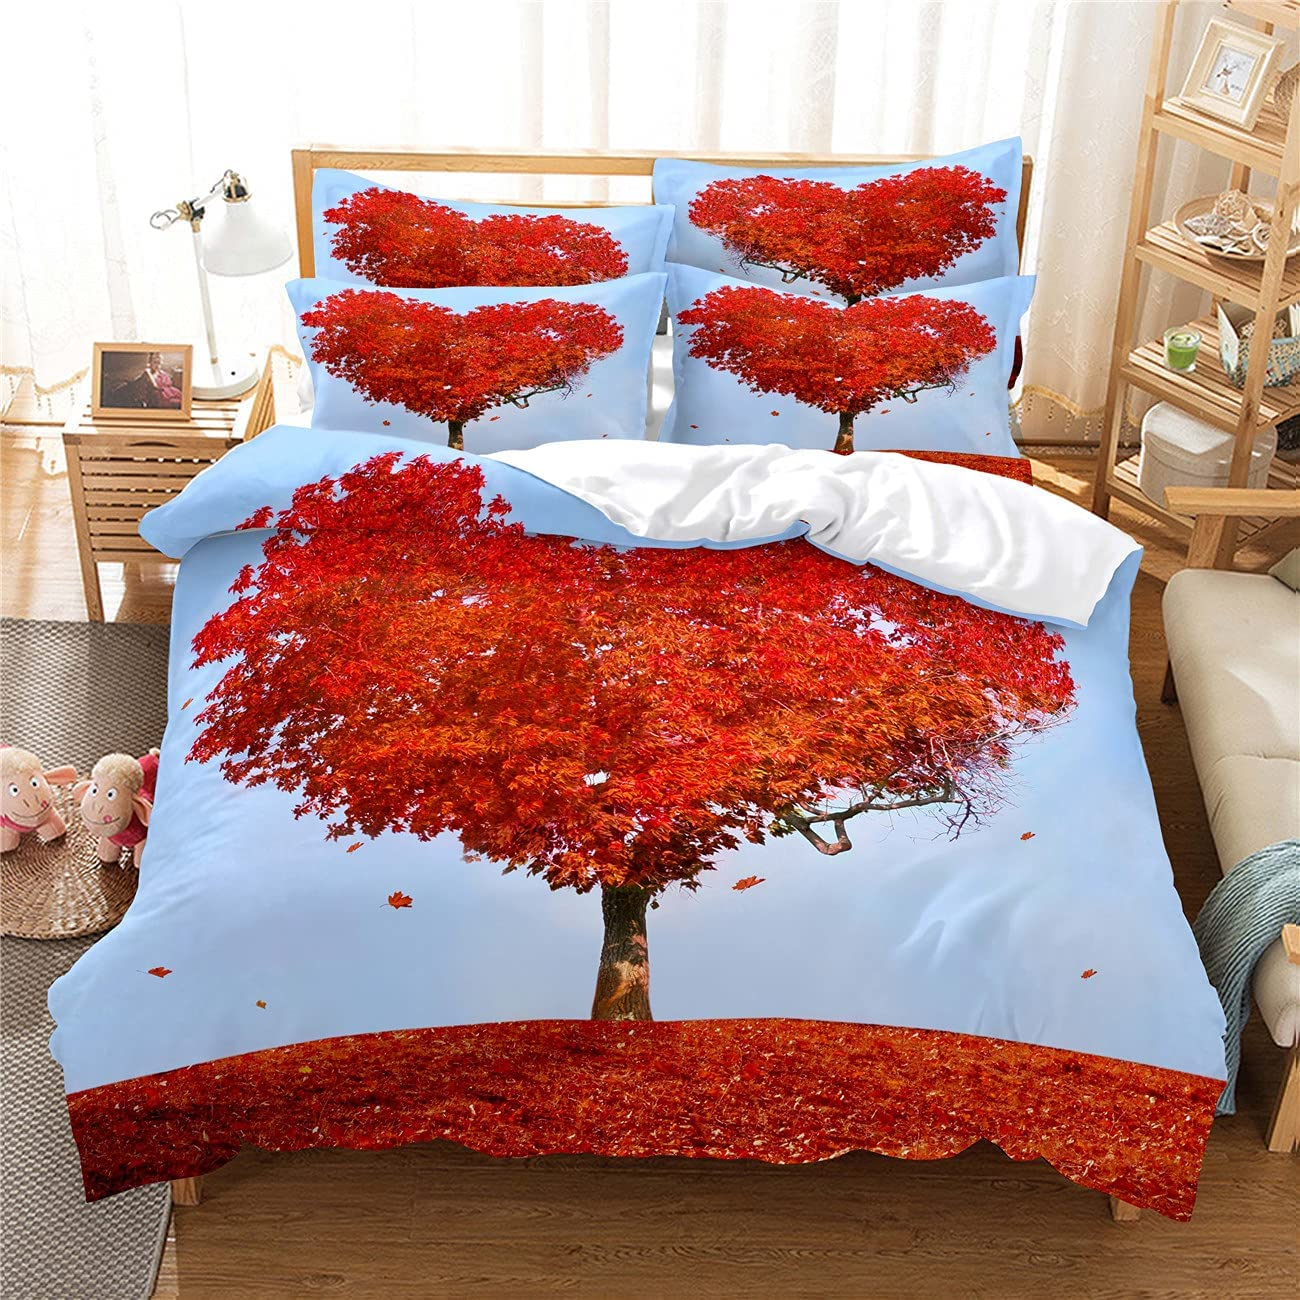 Quilt Cover Home Furnishing Great interest Award Bedding Reddish Leaves Digit Brown